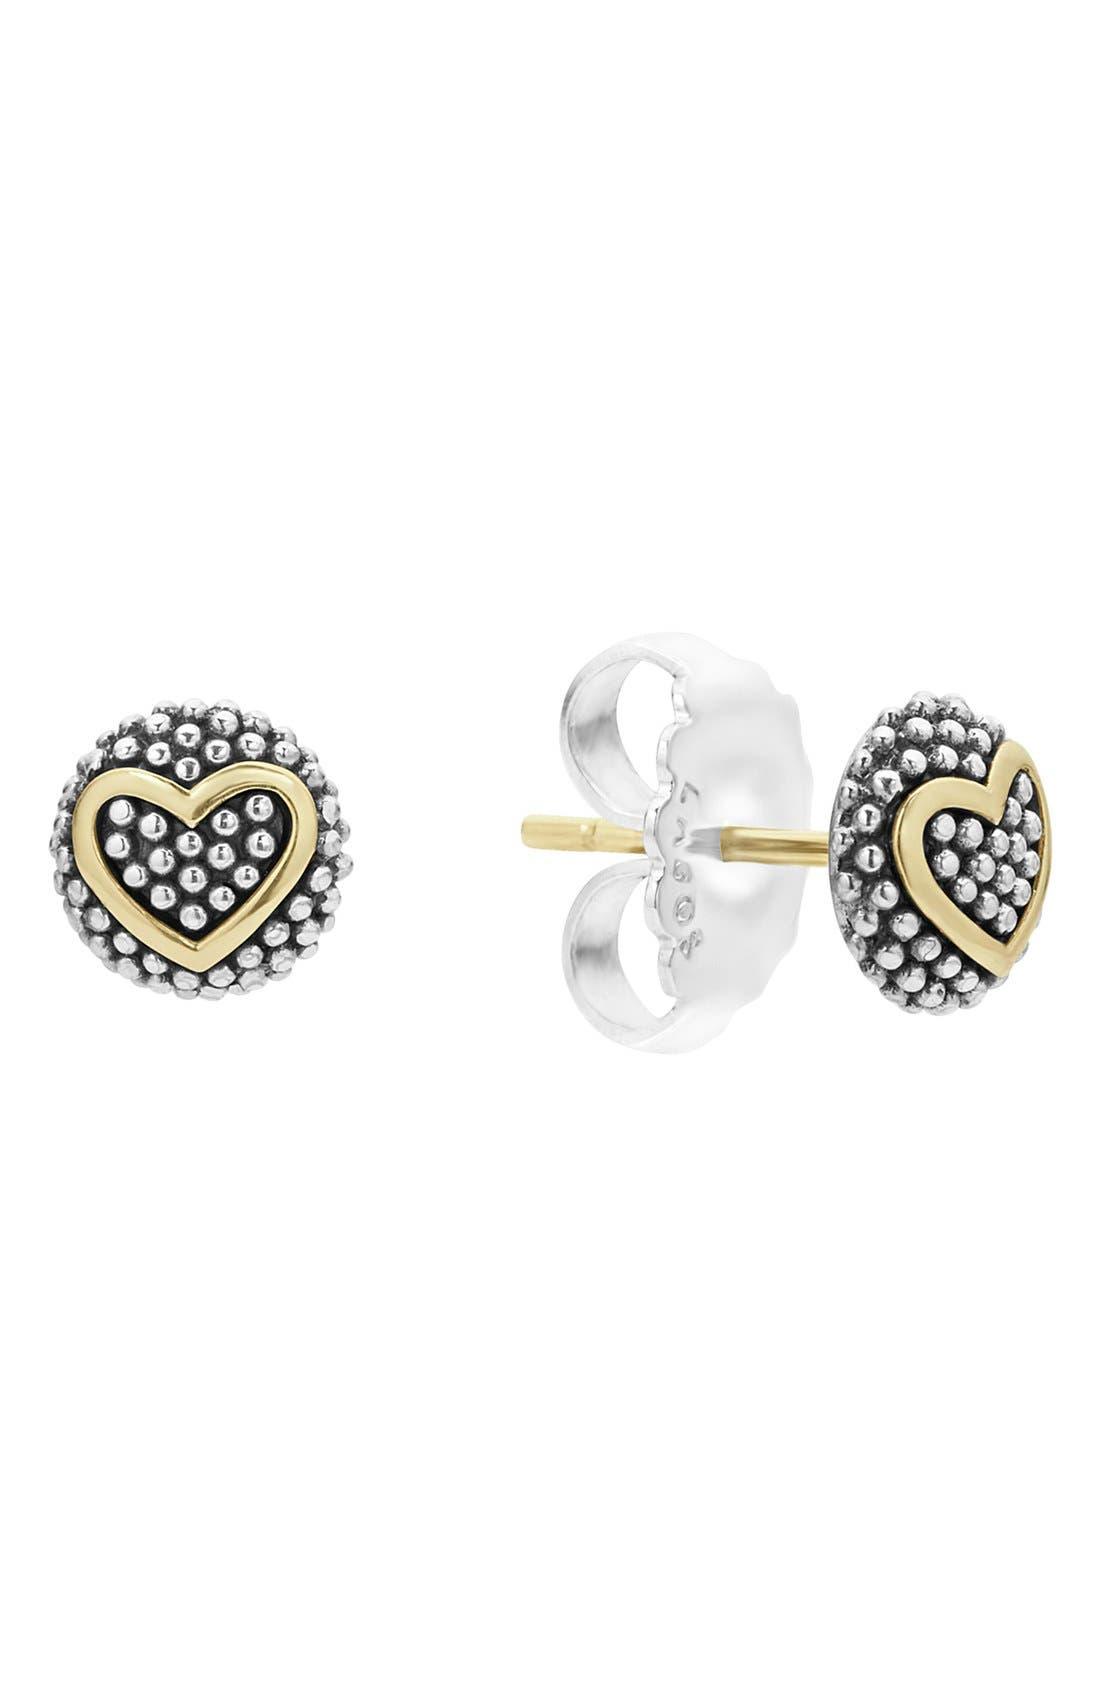 'Caviar' Heart Stud Earrings,                             Alternate thumbnail 3, color,                             SILVER/ GOLD